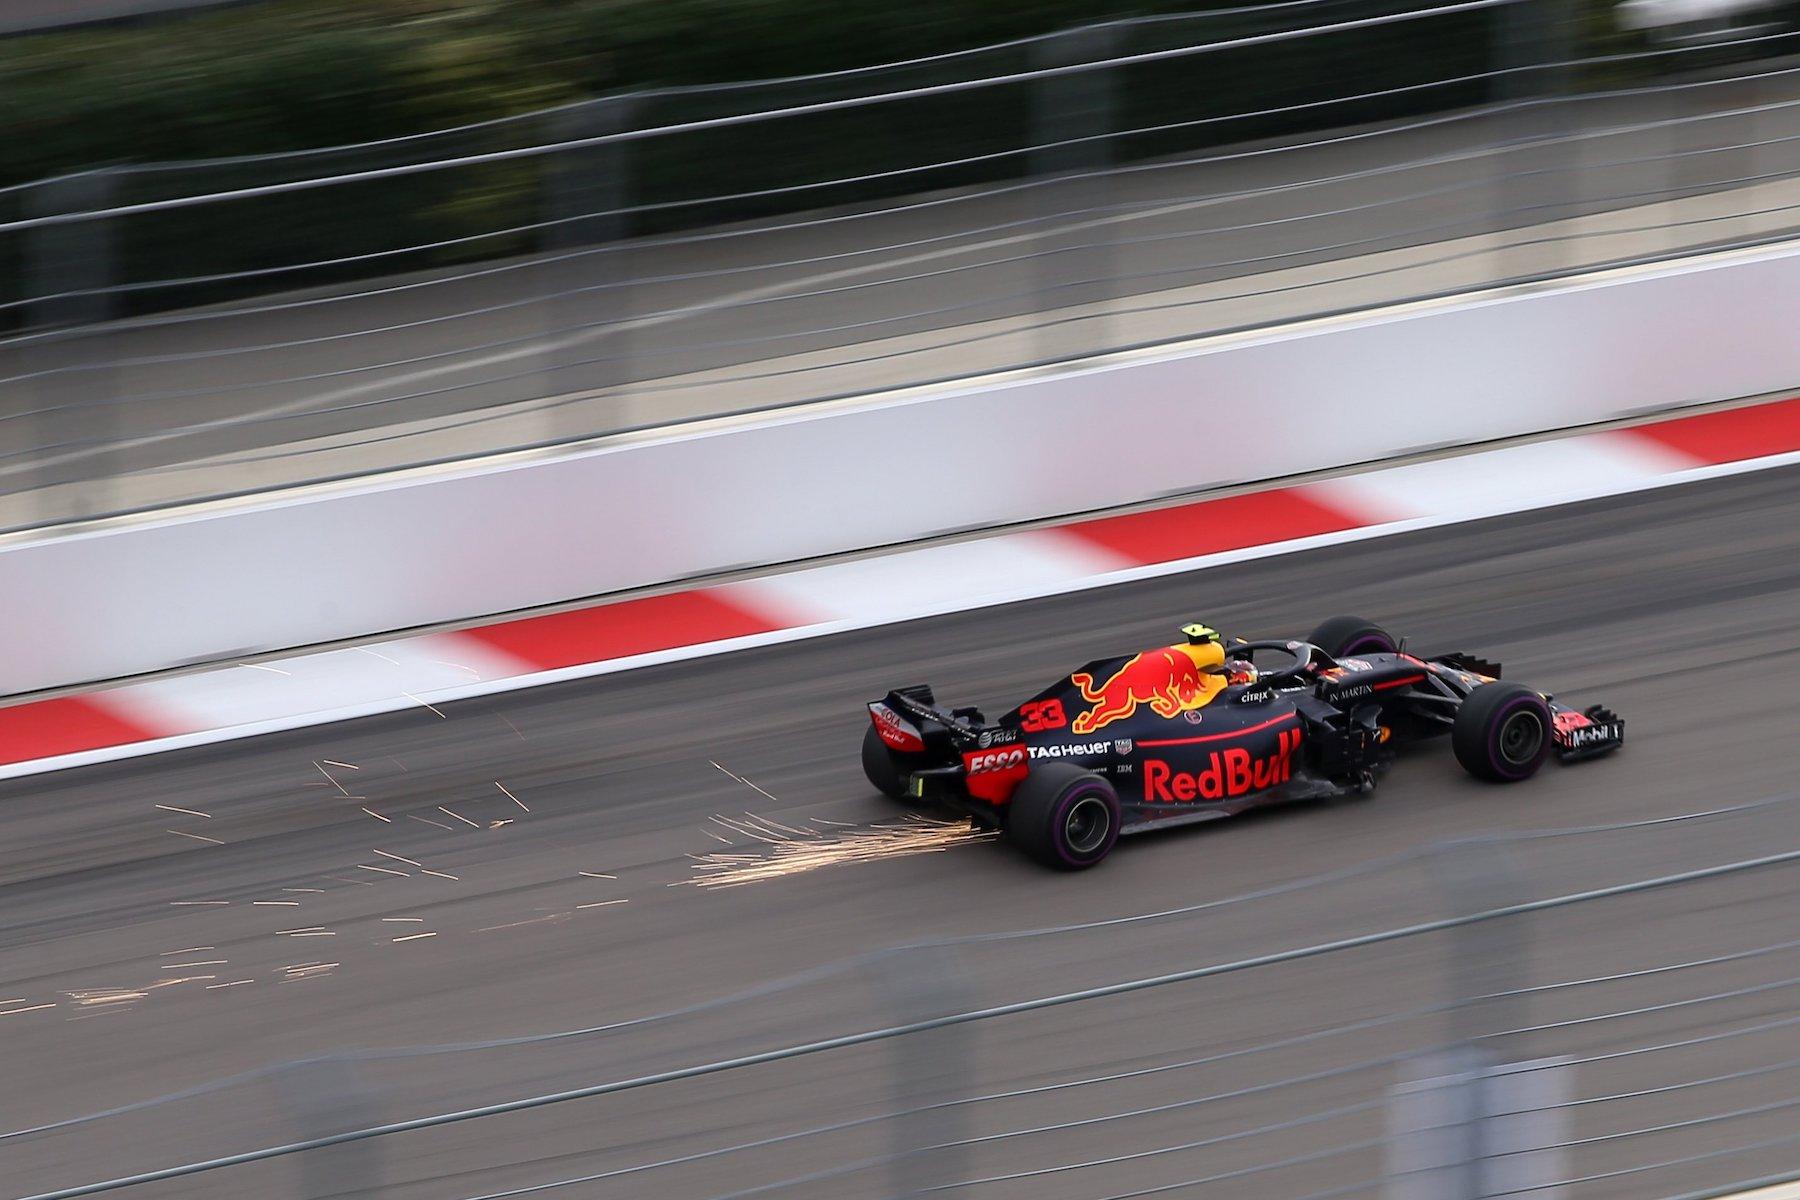 2018 Max Verstappen | Red Bull RB14 | 2018 Russian GP FP3 1 copy.jpg